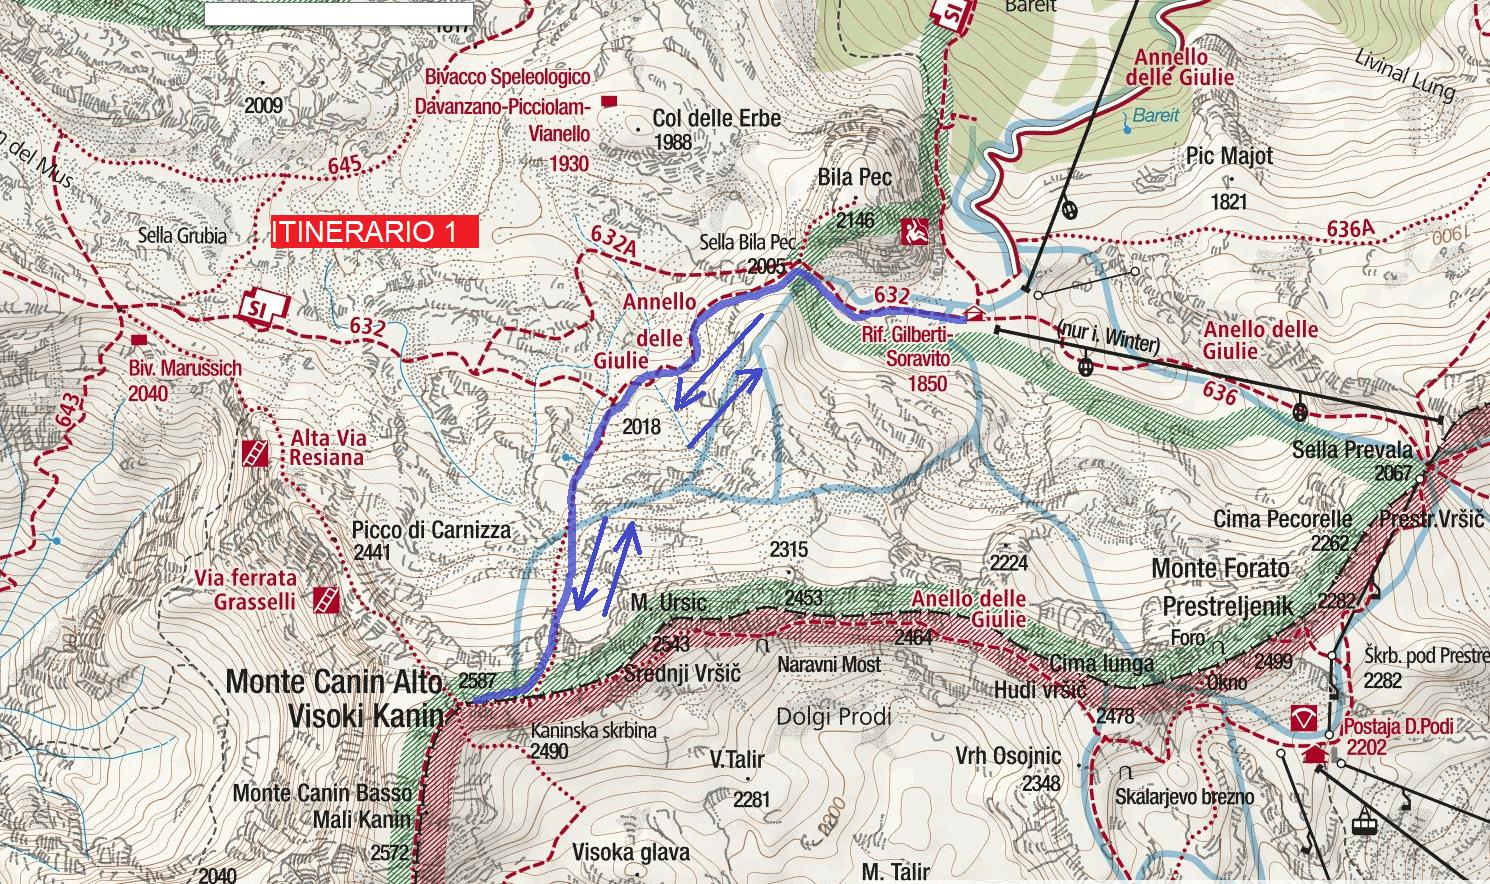 Julia Canin Ferrata Map Itinerary 1 Return to Cenge